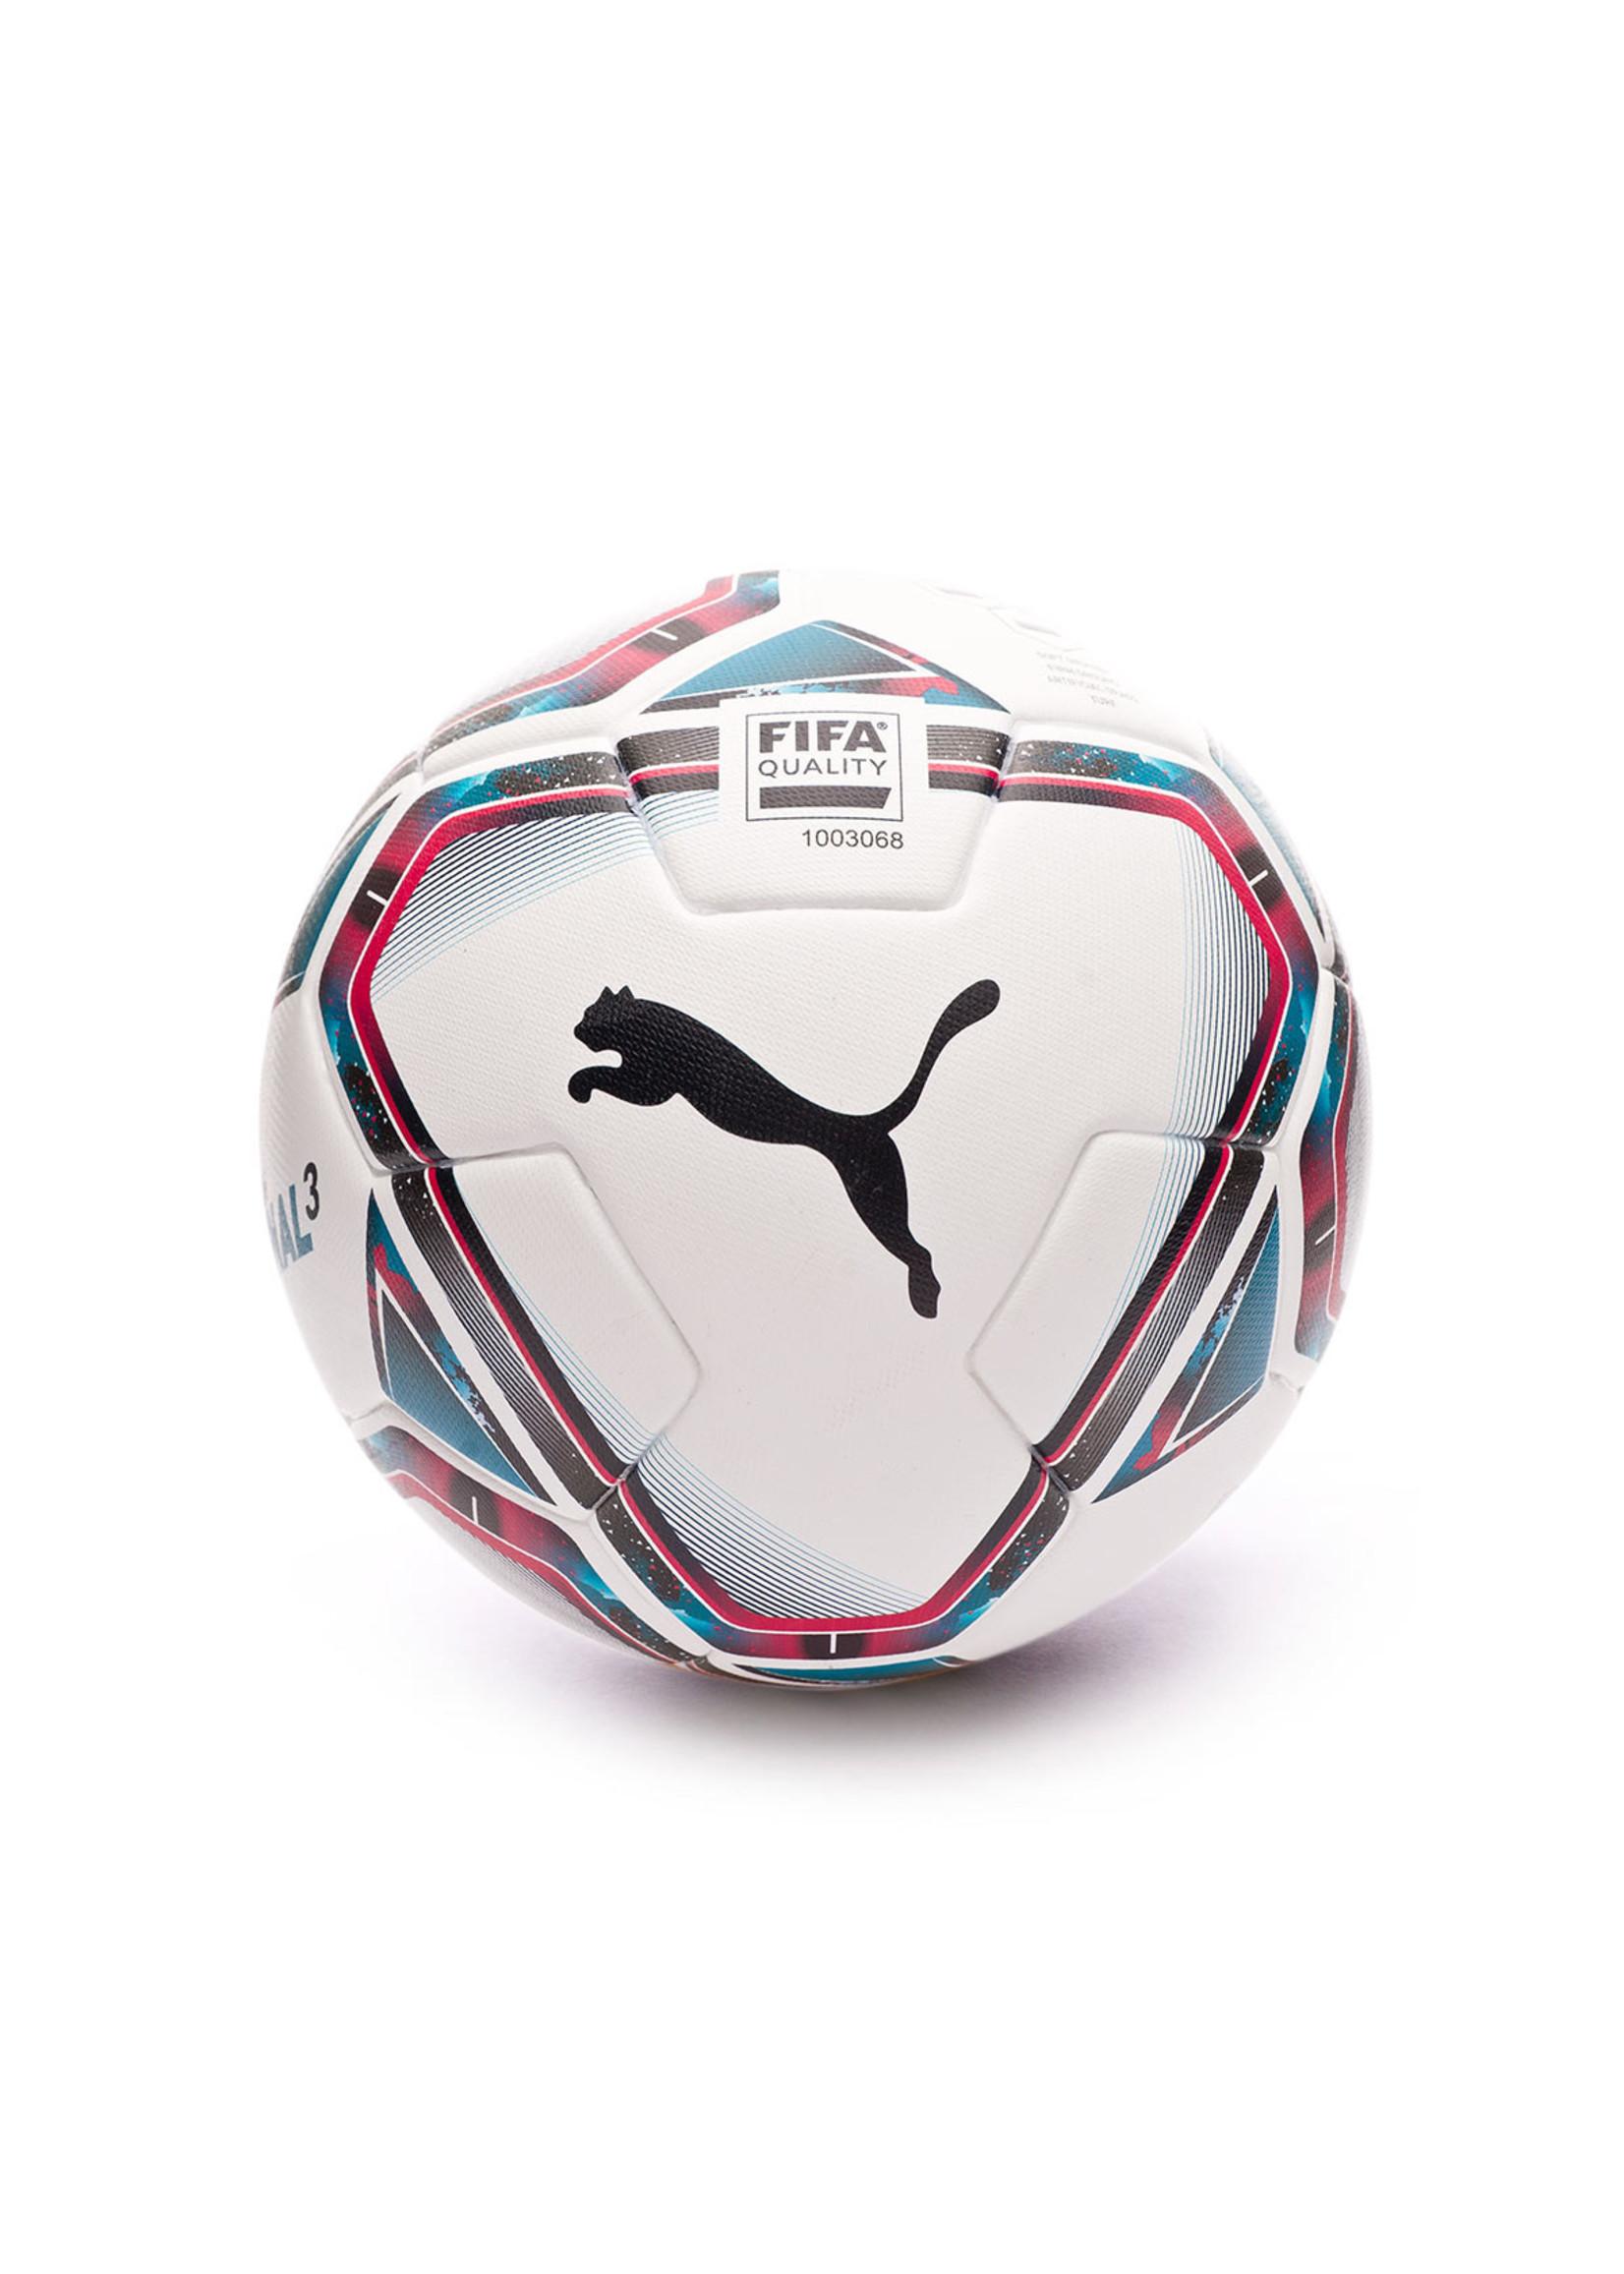 Puma SOCCER BALL PUMA TEAM FINAL 21.6 BLANC-ROSE-BLEU